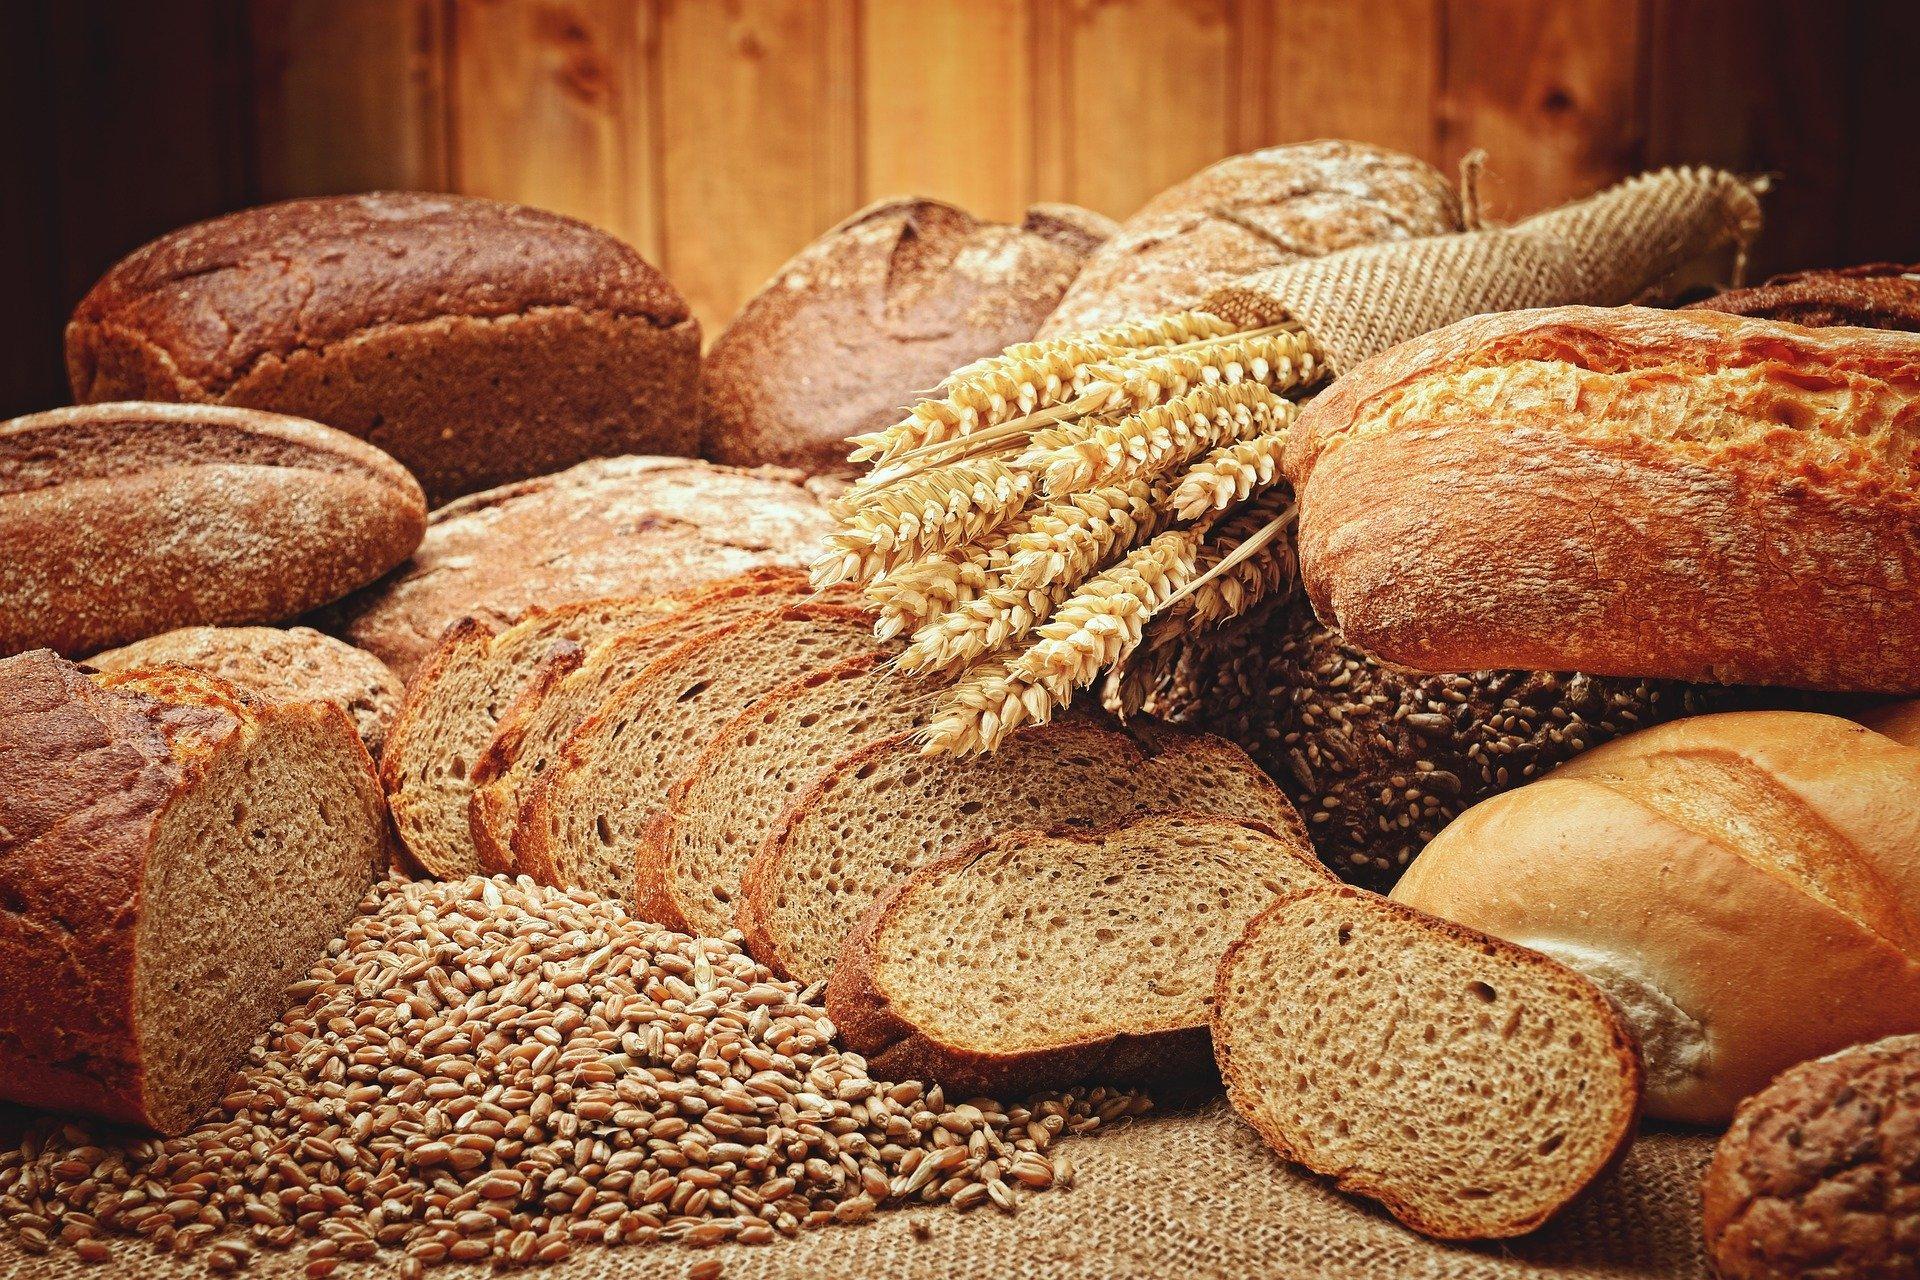 9 köstliche Brot Rezepte zum selber backen - DIY-Family